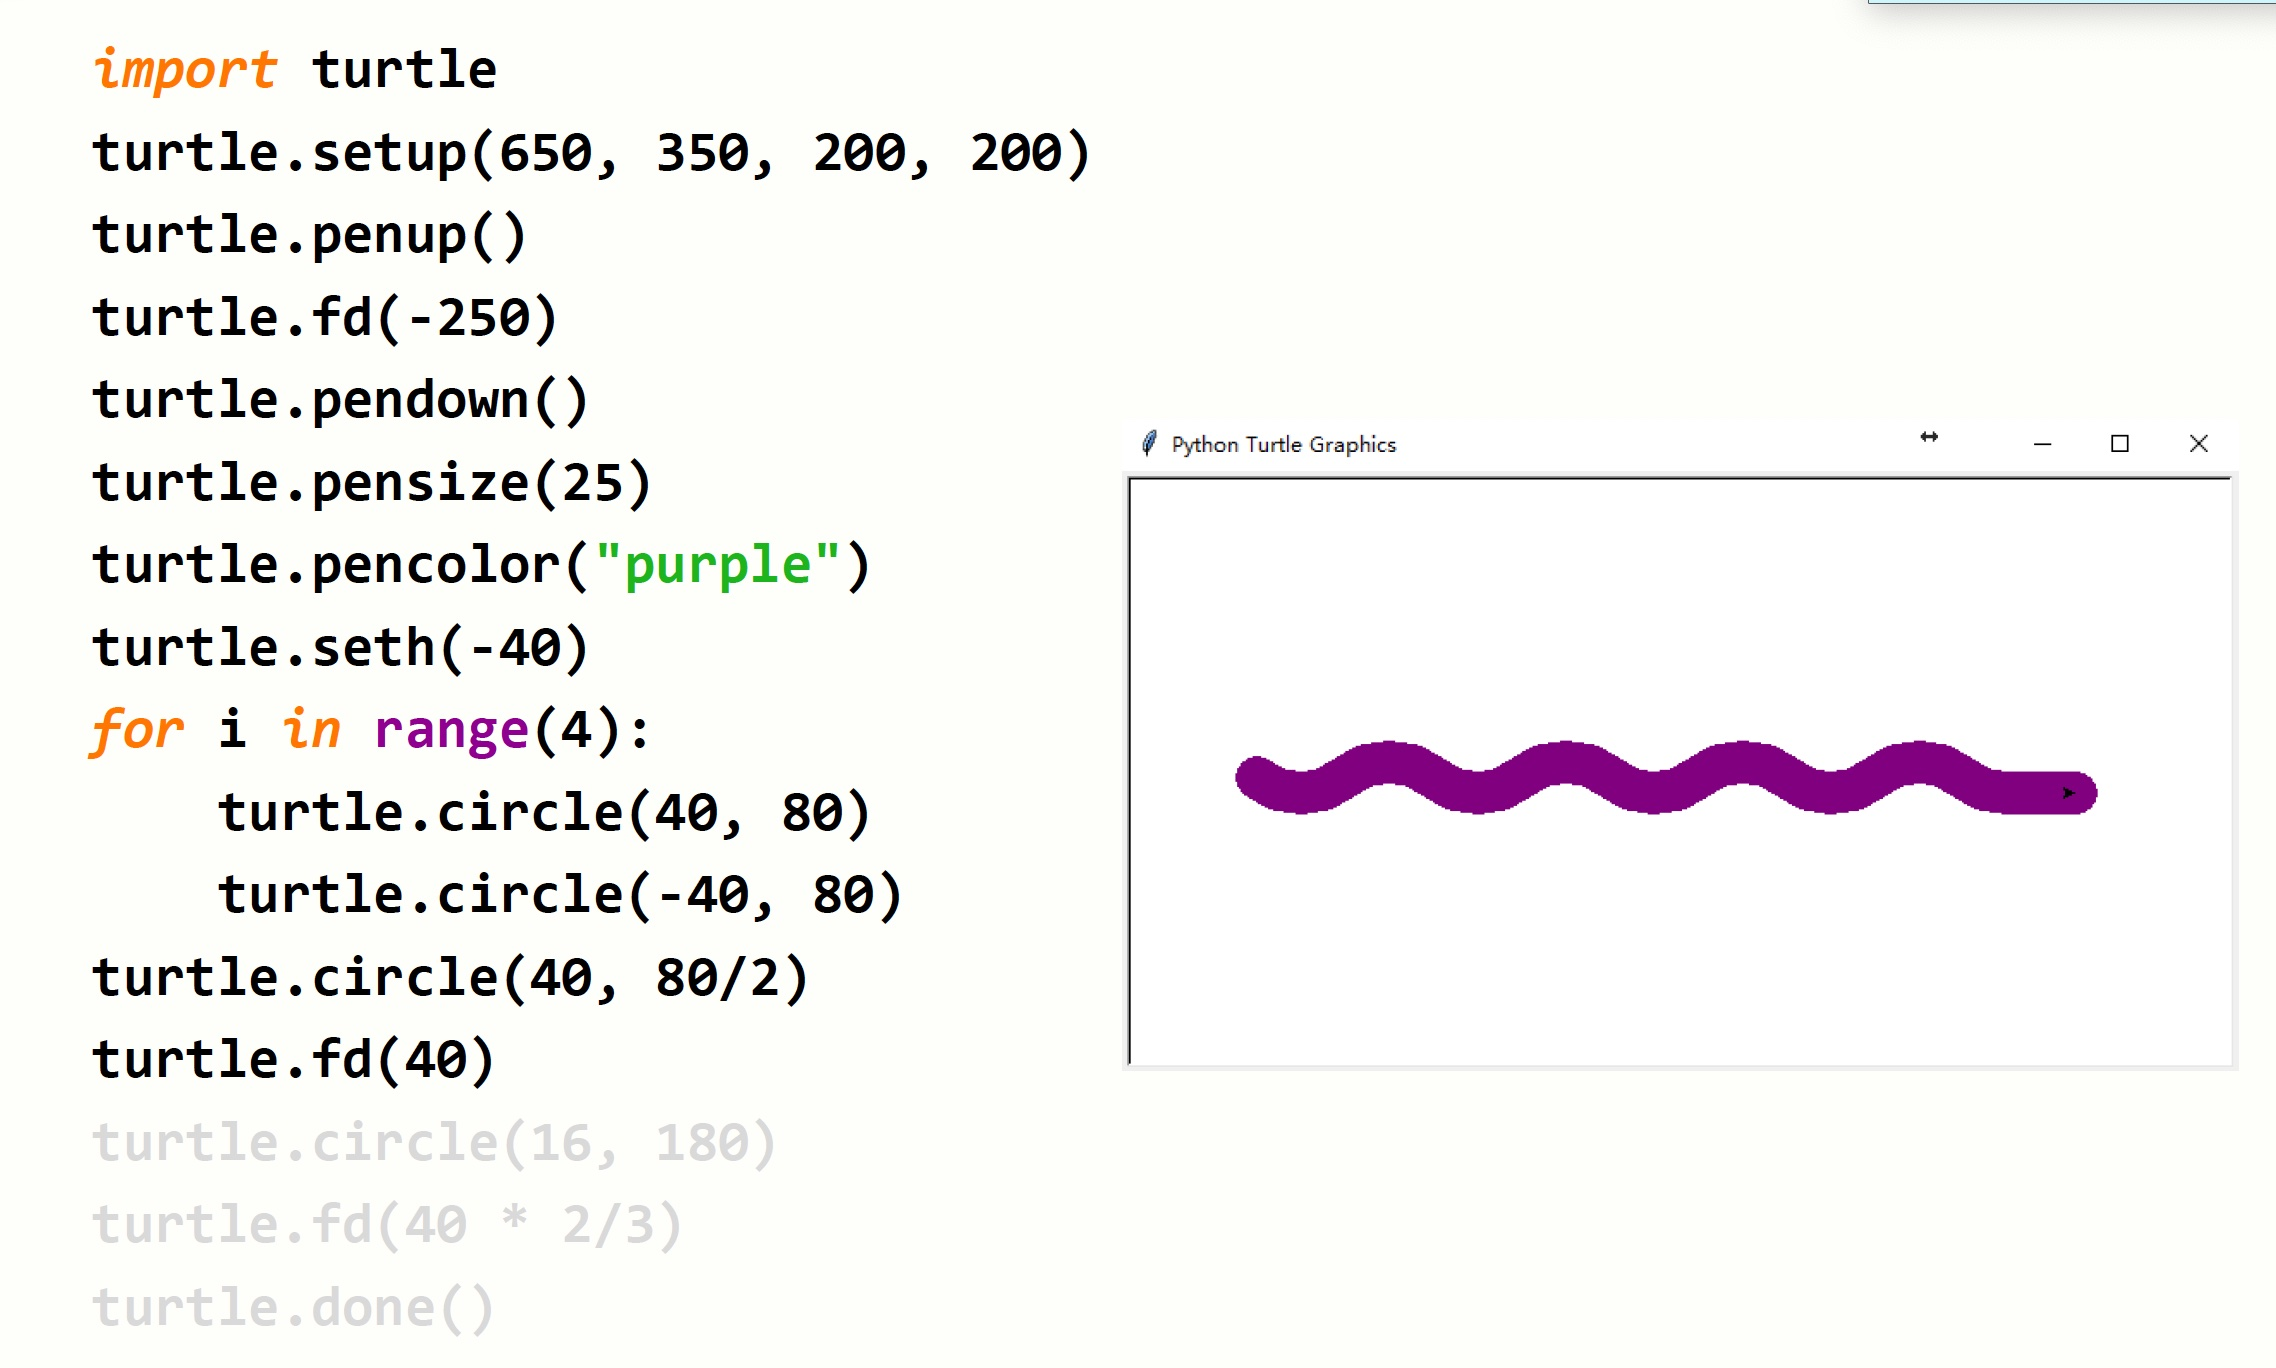 013-turtle程序语法元素分析-13.jpg?x-oss-process=style/watermark